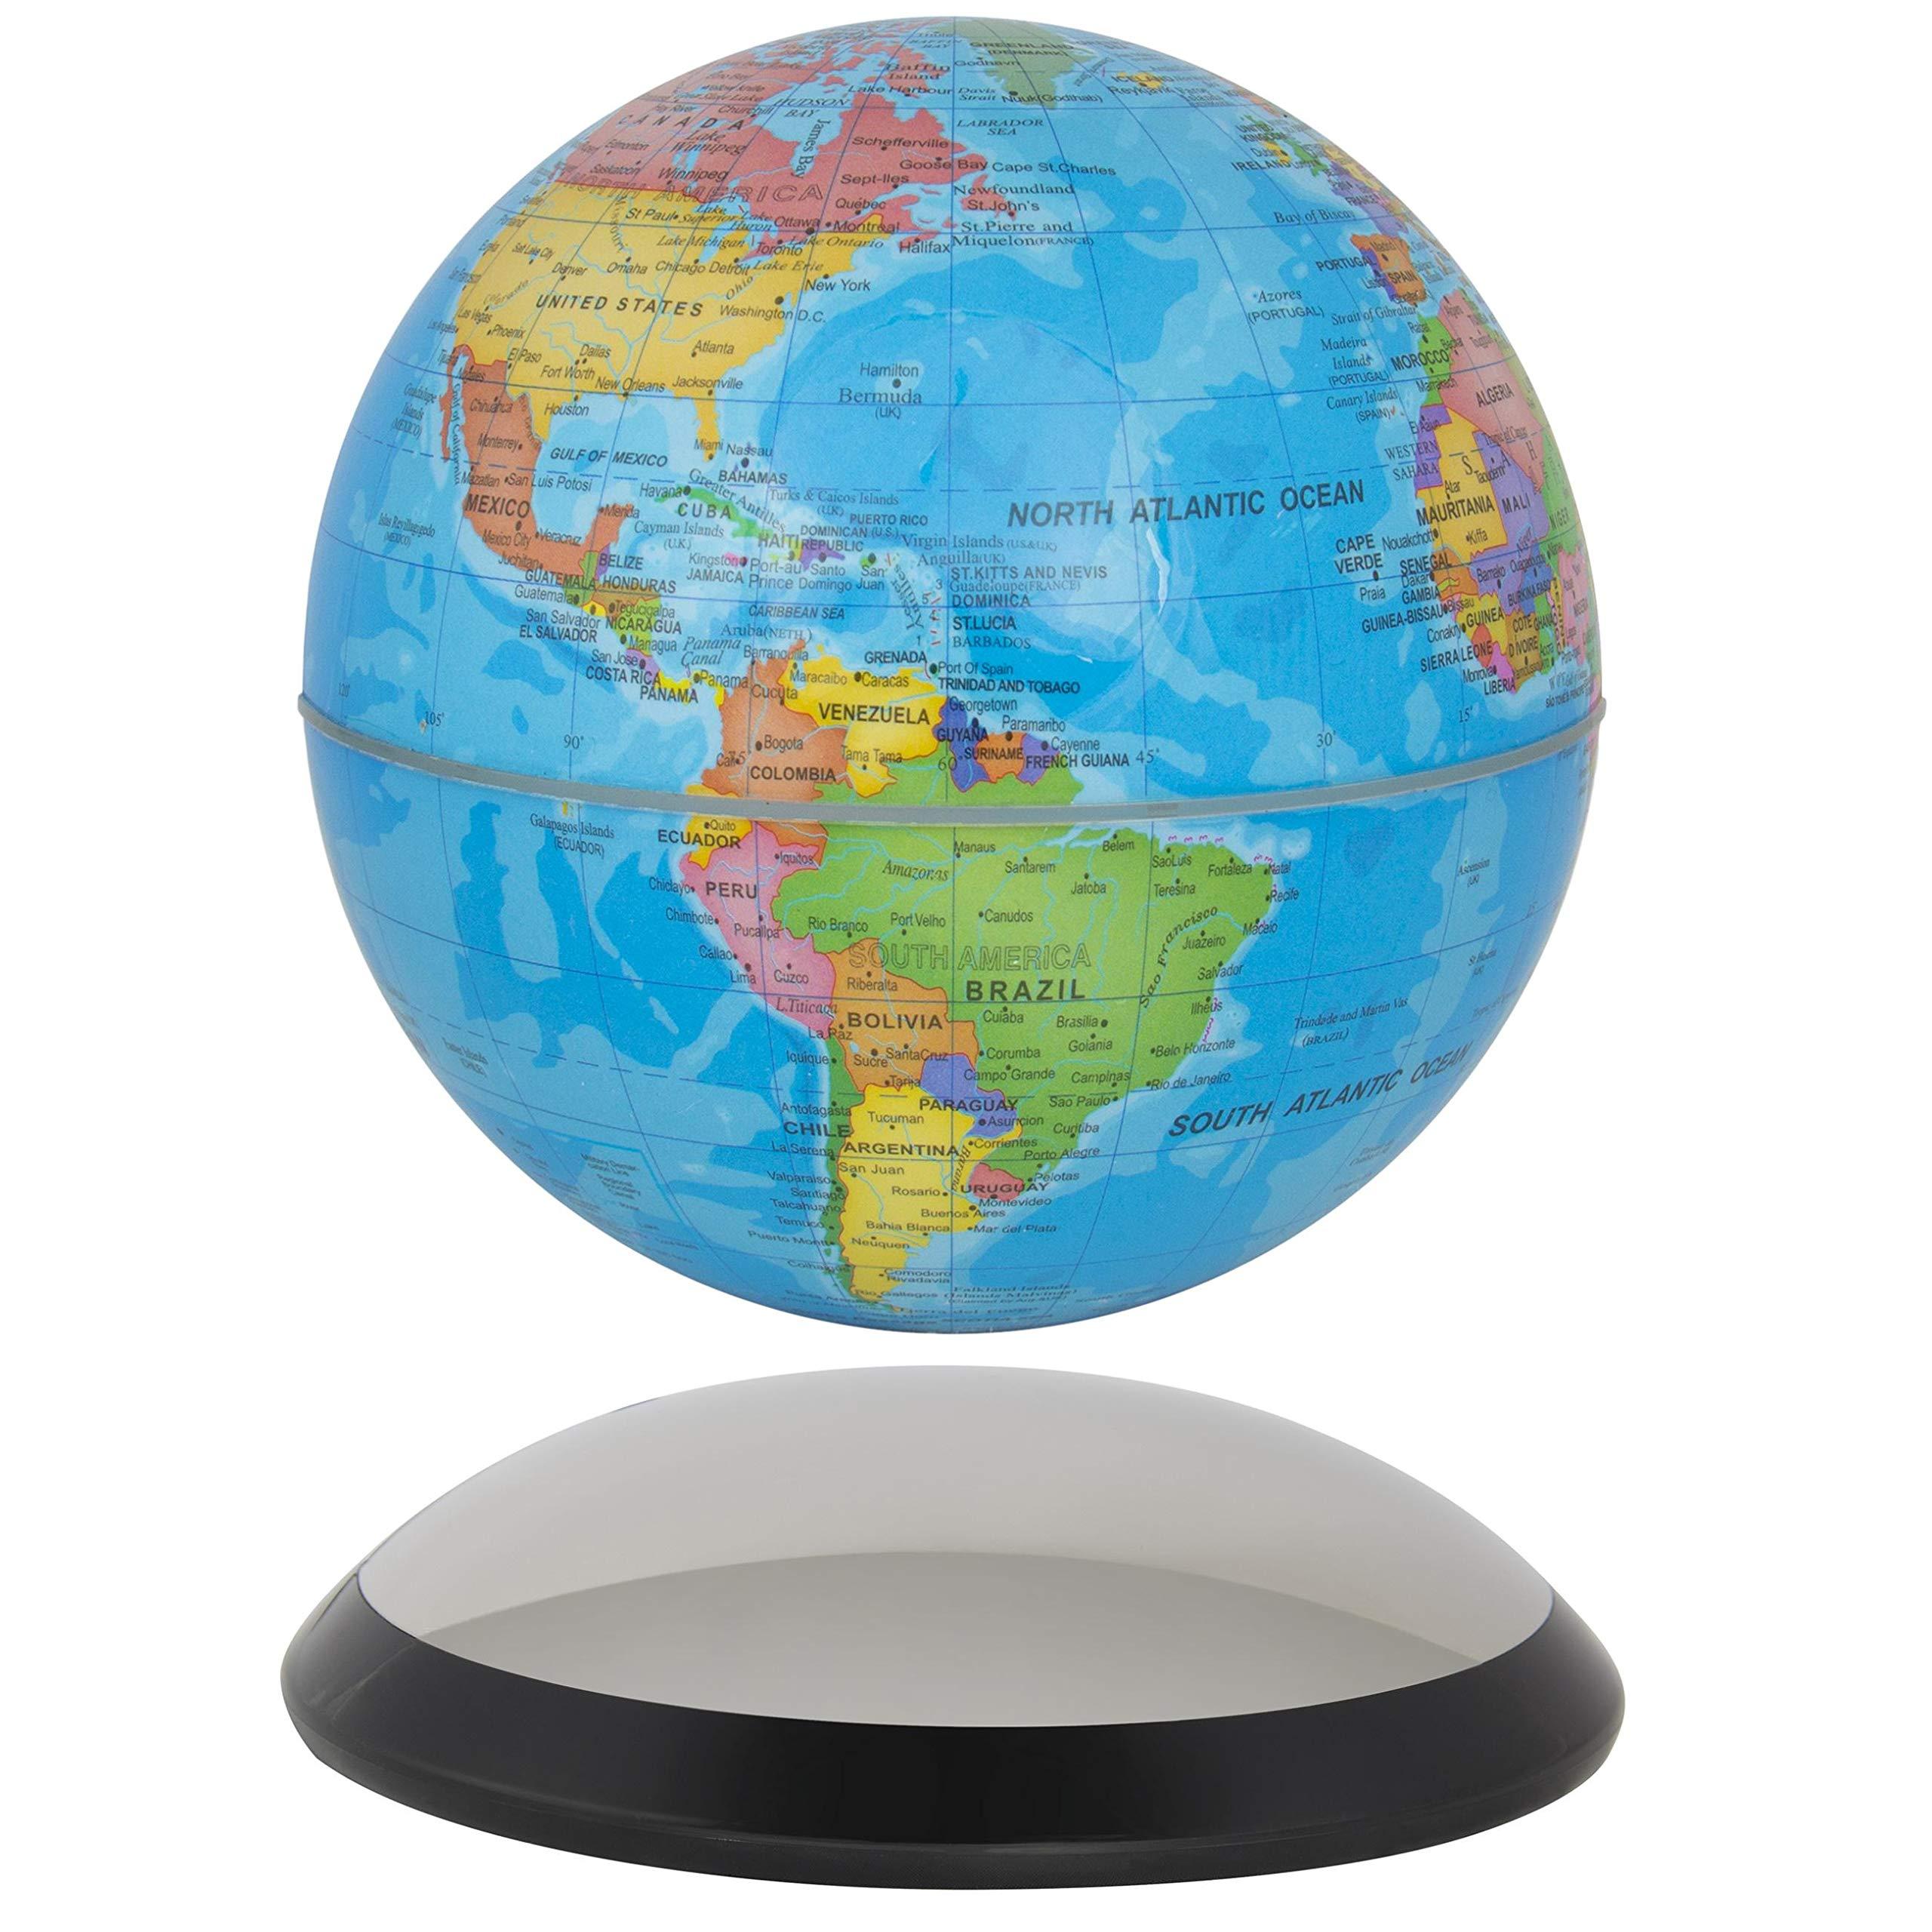 6'' Magnetic Rotating Globe Anti-Gravity Floating Levitating Earth (Glossy Finish) by Liberty Imports